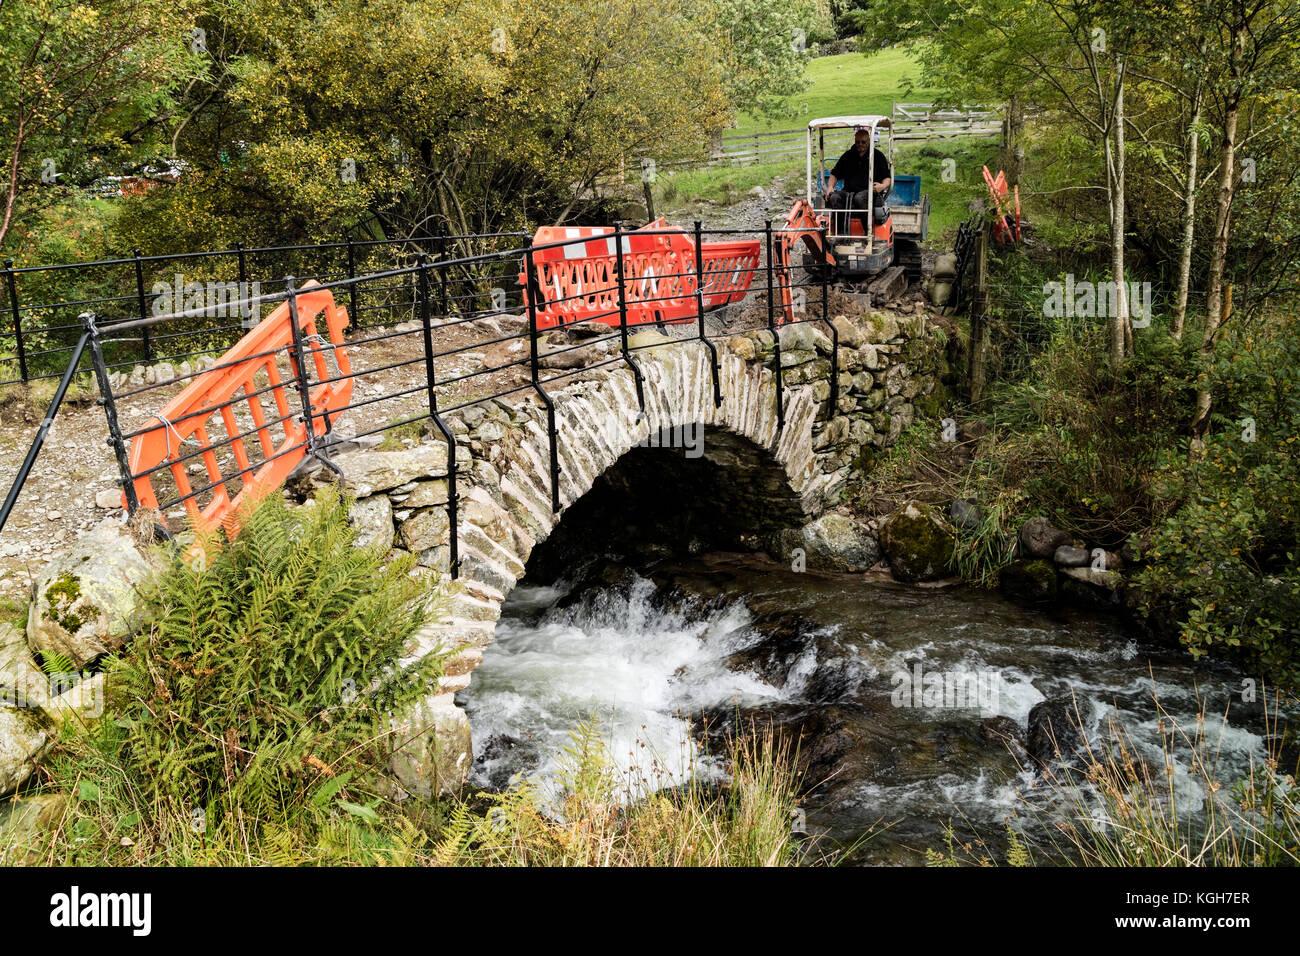 Bridge Repairs Being Carried Out Due to Storm Flood Damage, Hartsop, Lake District, Cumbria, UK - Stock Image